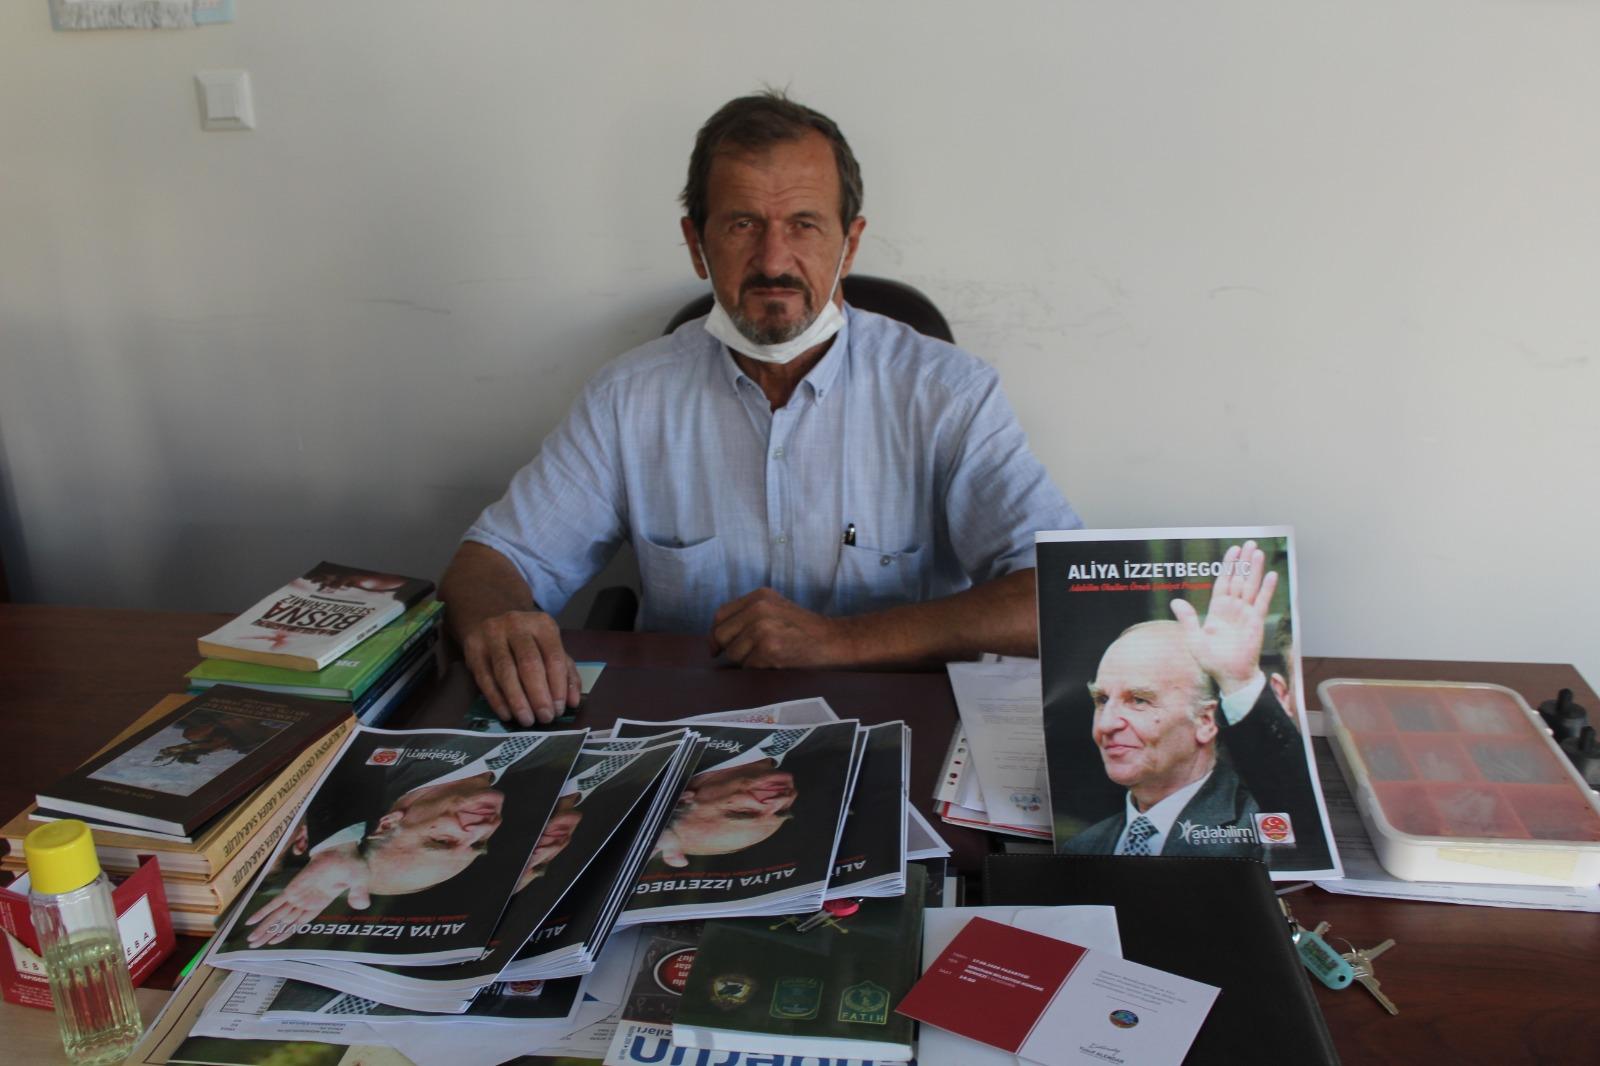 Bosna Sancak'tan davet